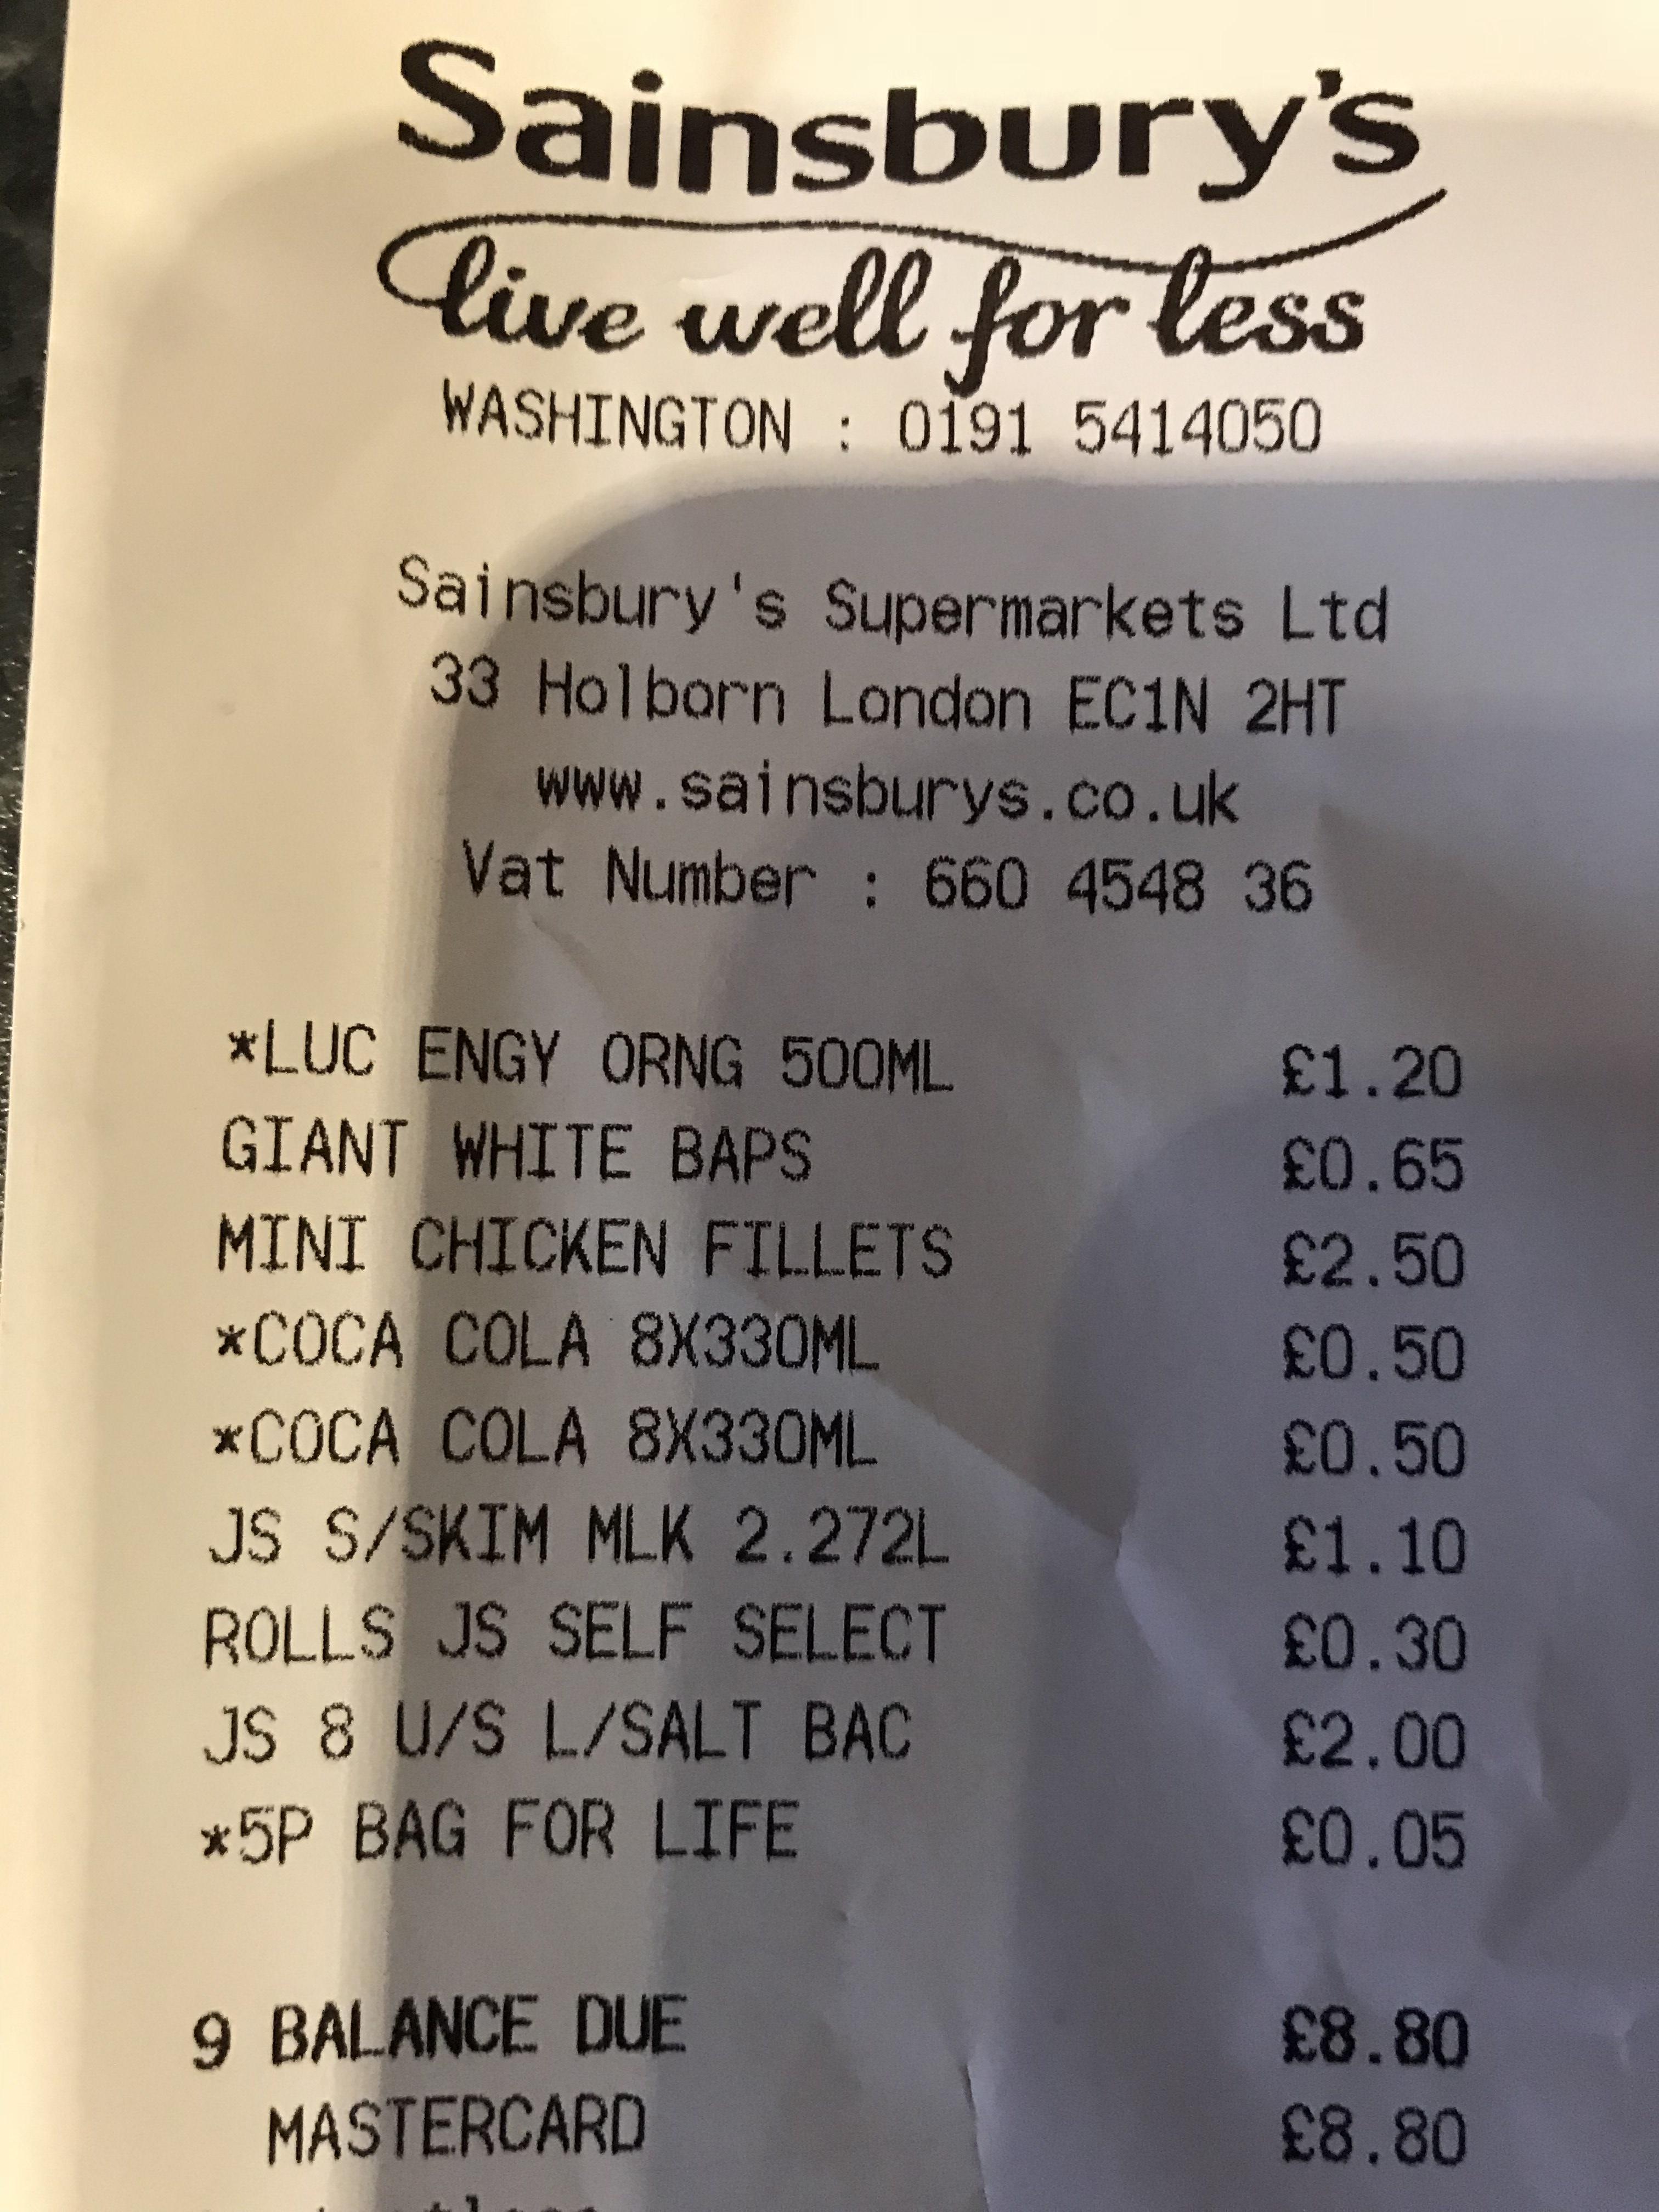 8 x Cans Coke 50p instore at Sainsburys -  Washington